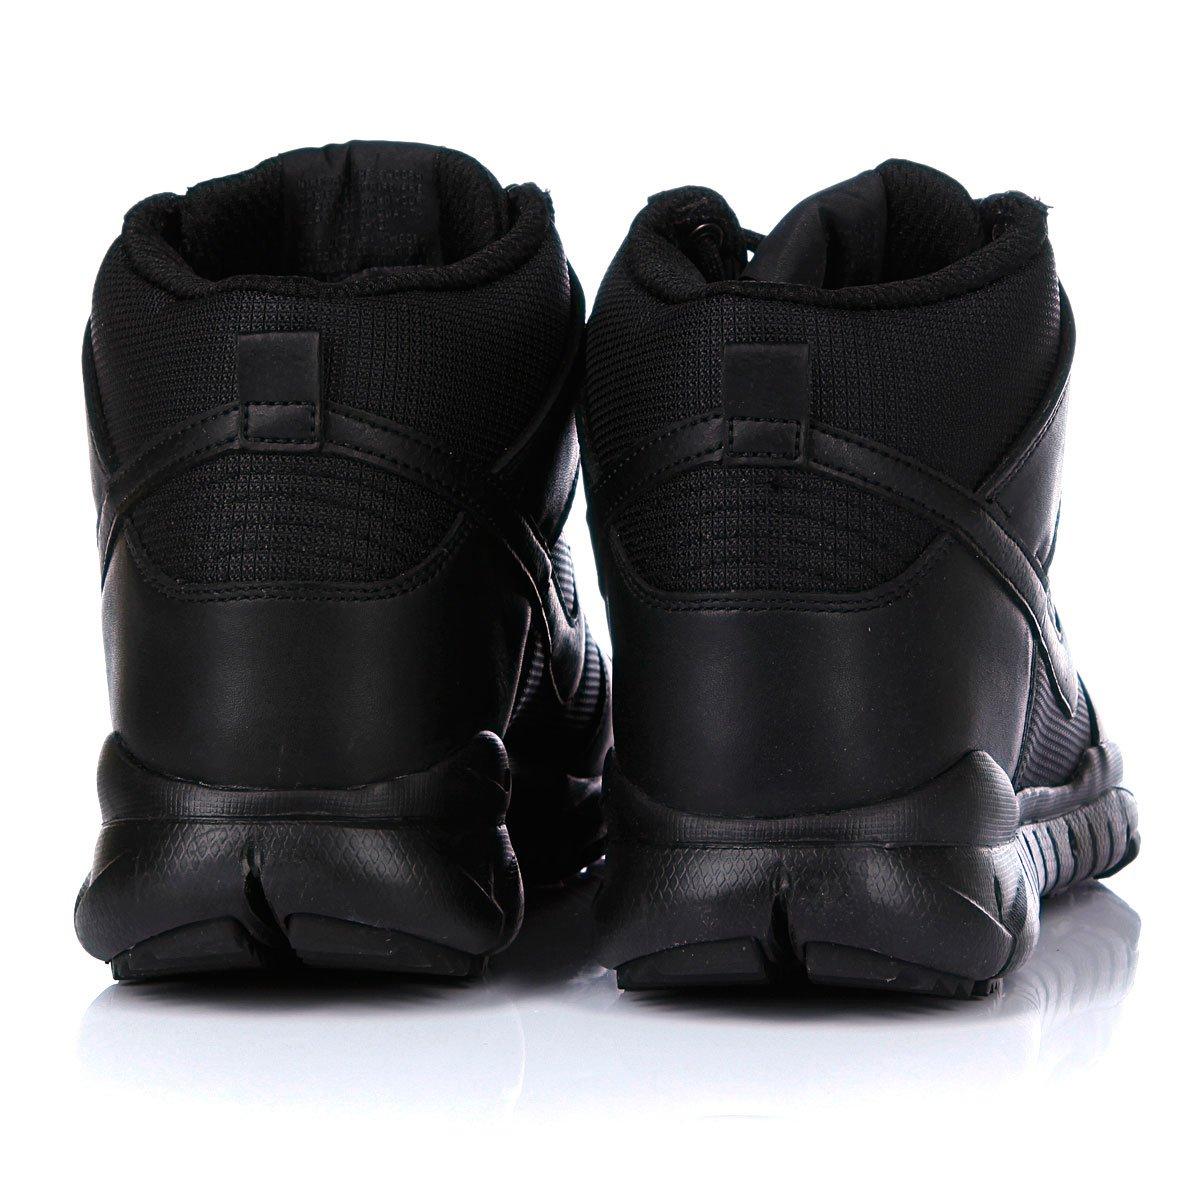 hot sale online 238b7 cd98c Купить кеды утепленные Nike Dunk High OMS Black/Black ...